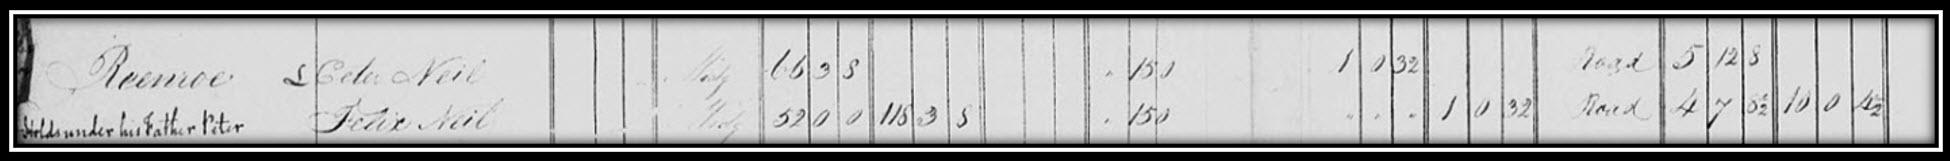 1826 Tithe Applotment List (Reenroe)